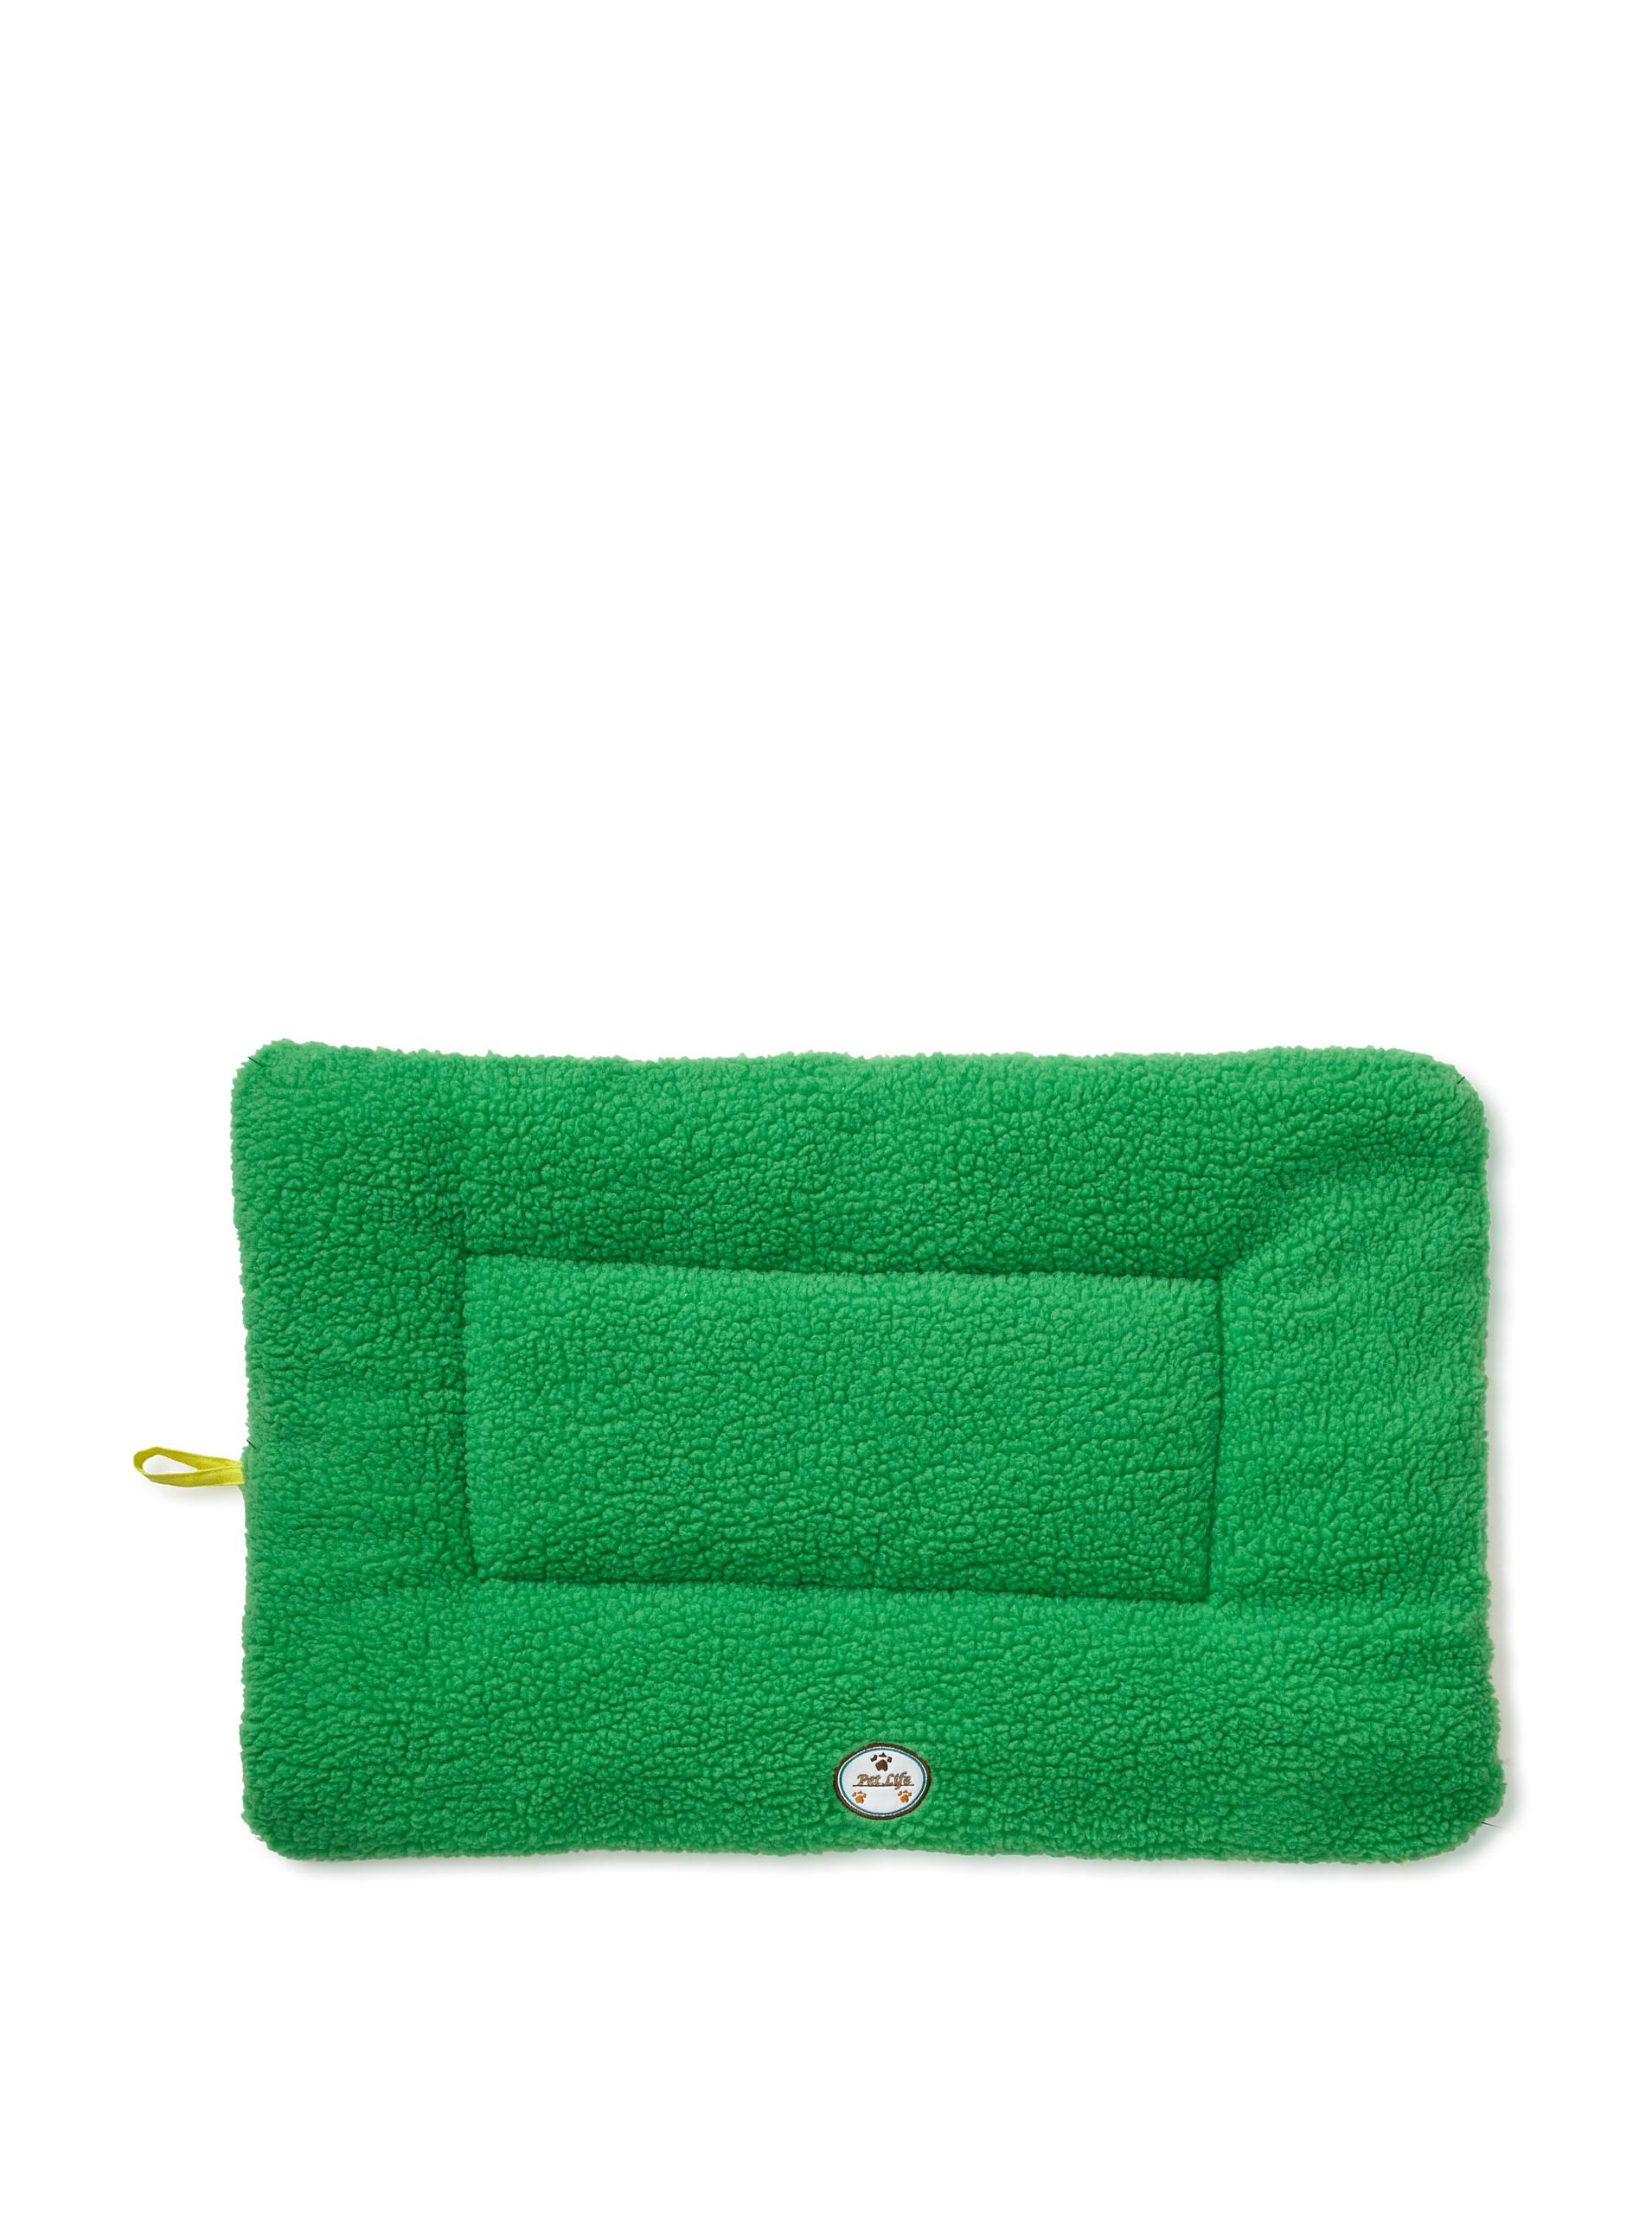 Pet Life Eco-Paw Reversible Pet Bed (Green/Yellow)